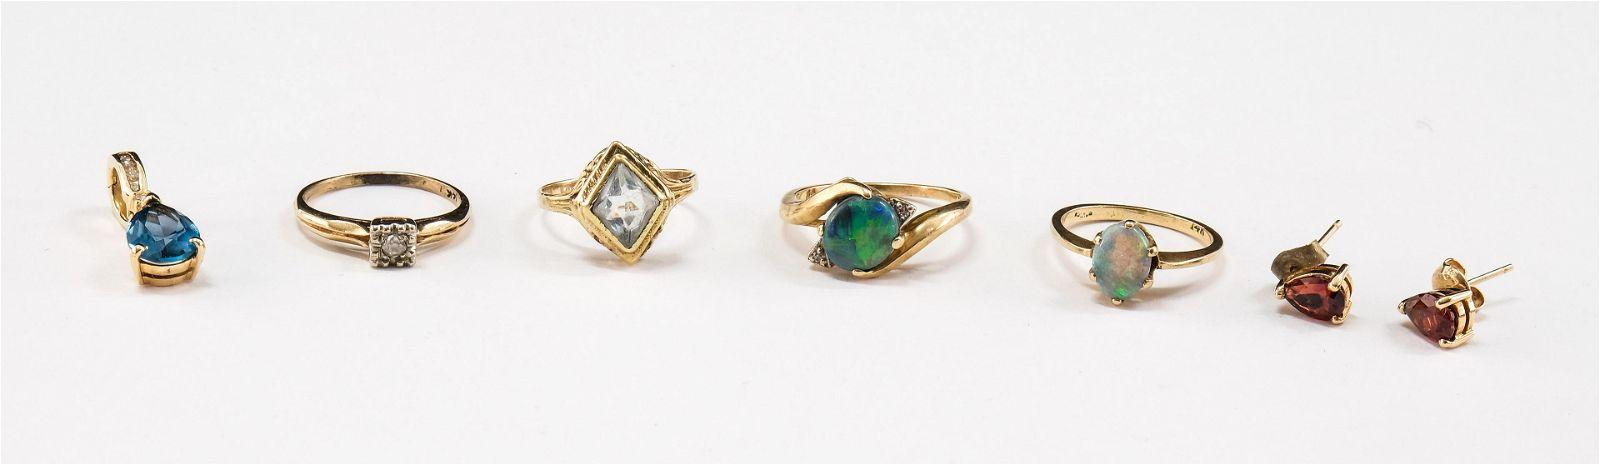 Ladies 14K Estate Jewelry Group